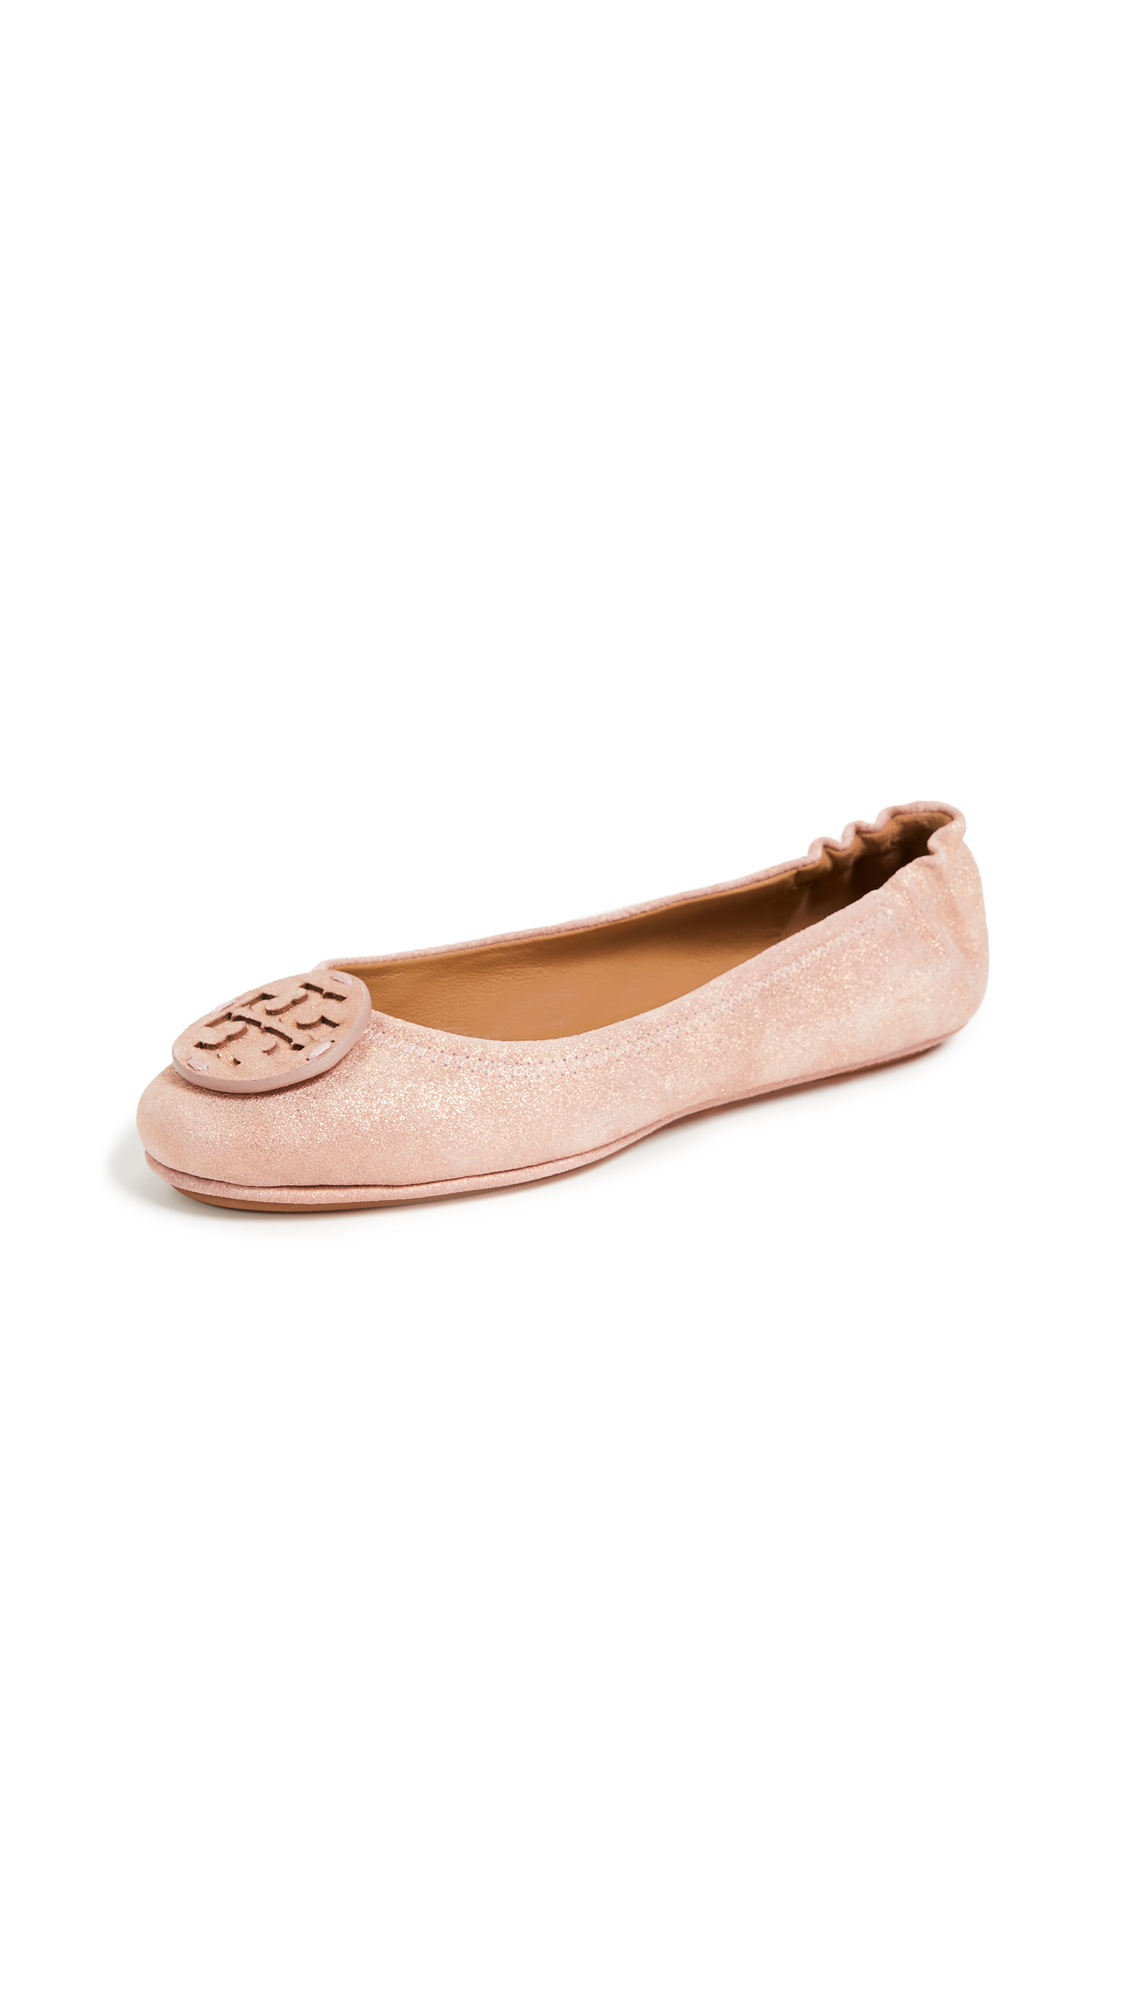 Tory Burch Minnie Travel Logo Ballet Flats - Metallic Sea Shell Pink